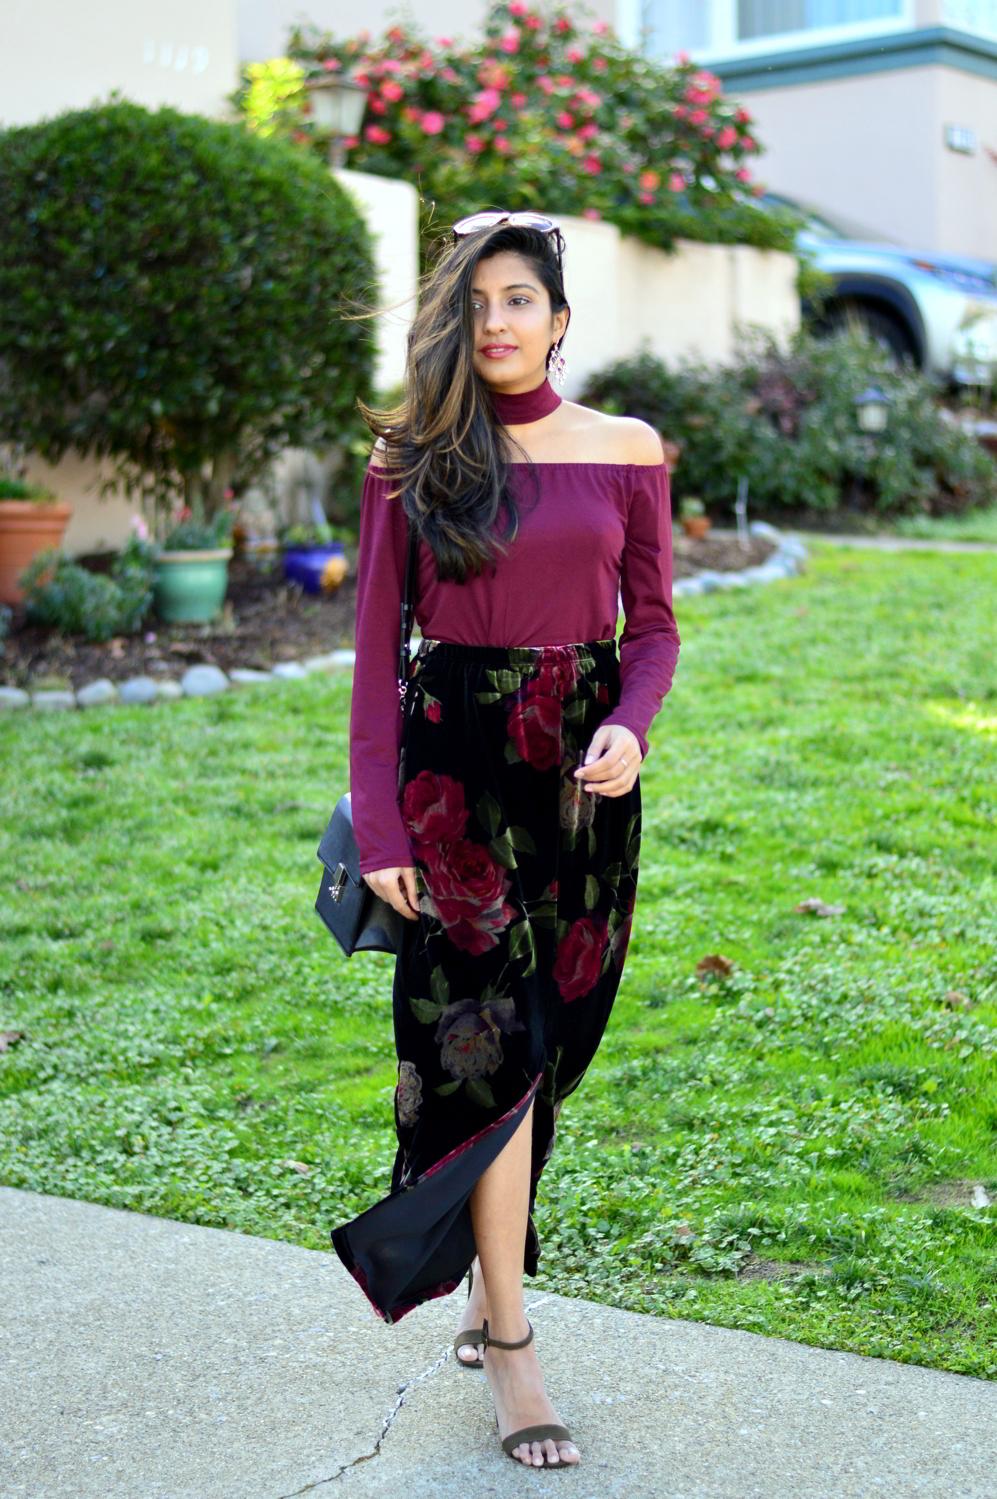 velvet-floral-skirt-choker-burgundy-top-party-outfit-NYE-blogger 5